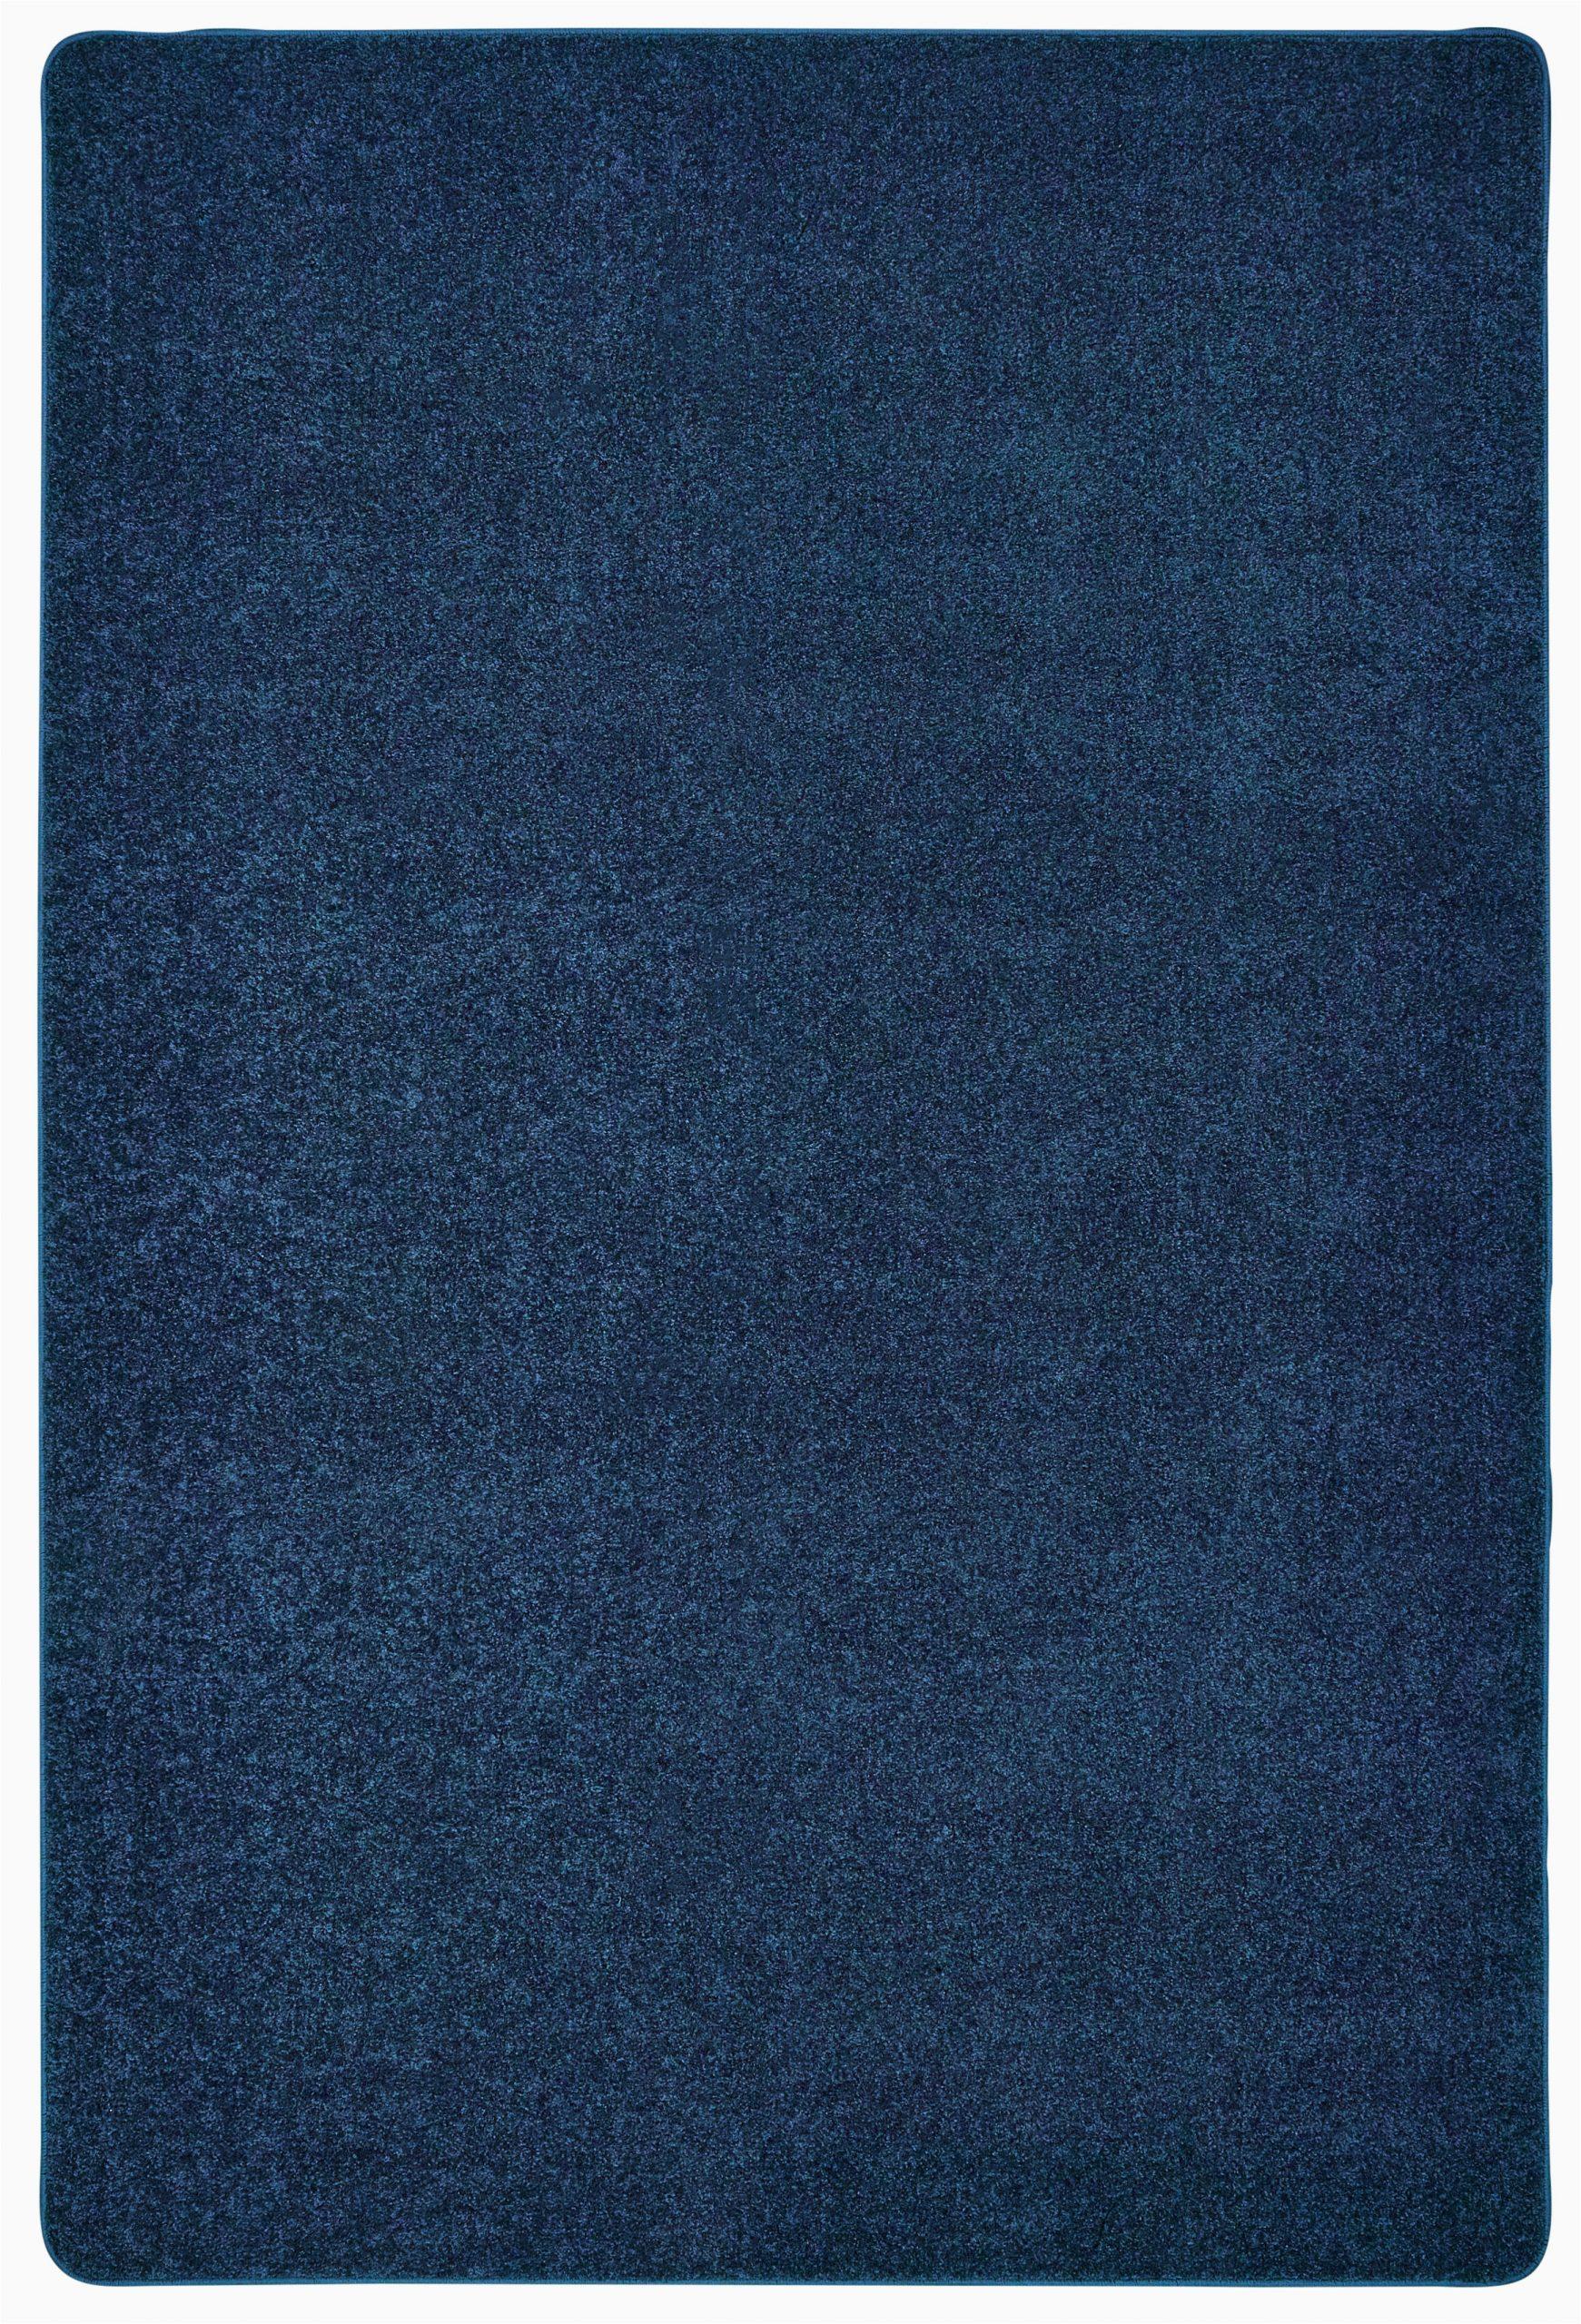 kidplush solids deep sea blue area rug